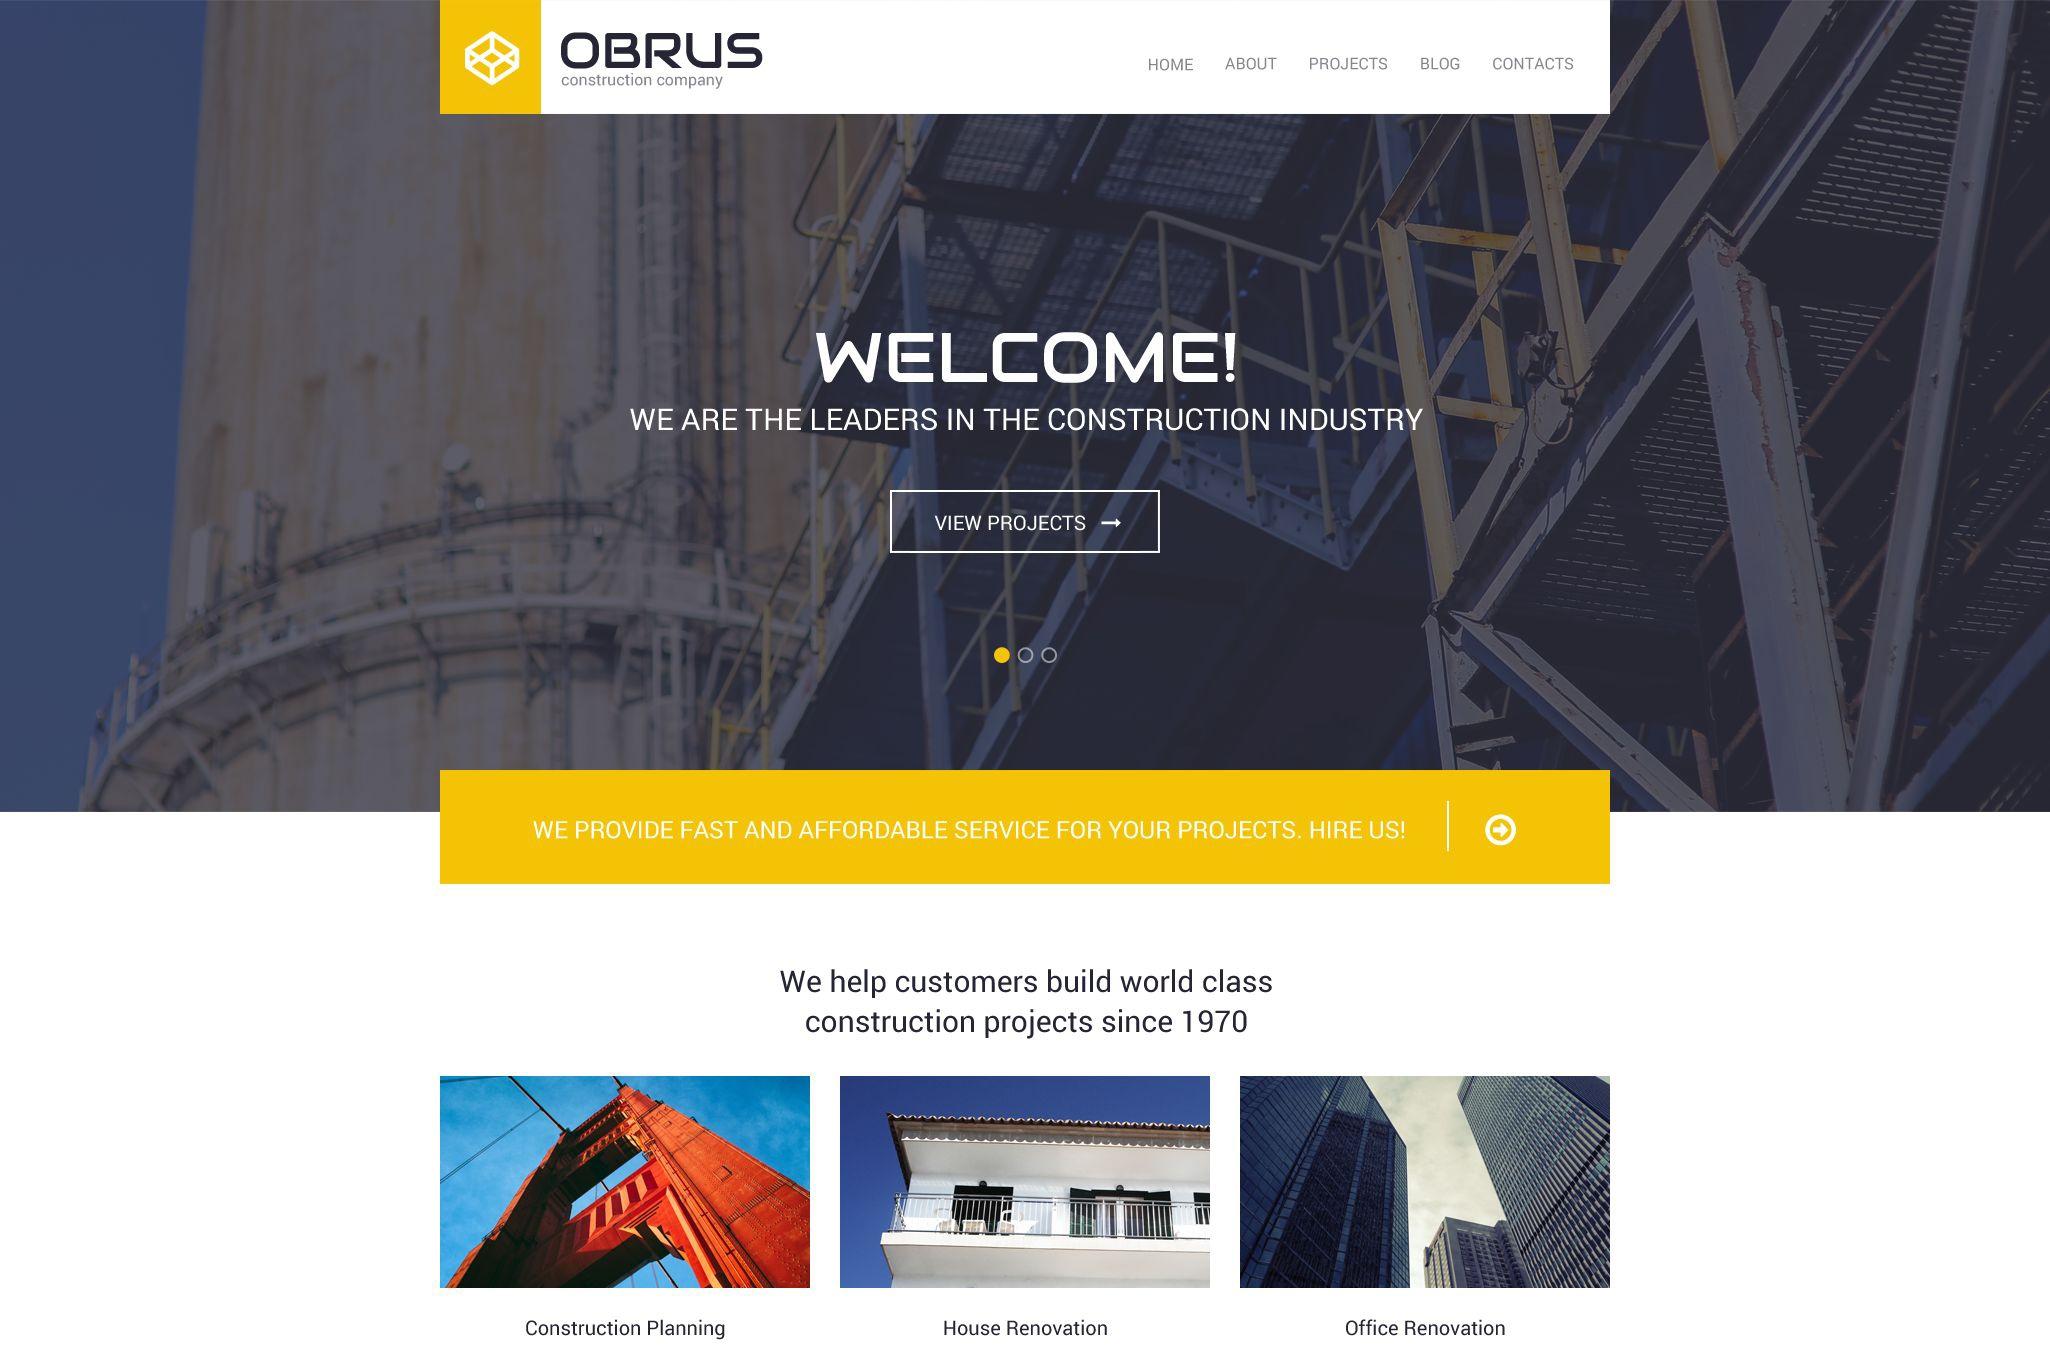 obrus-premium-wordpress-theme